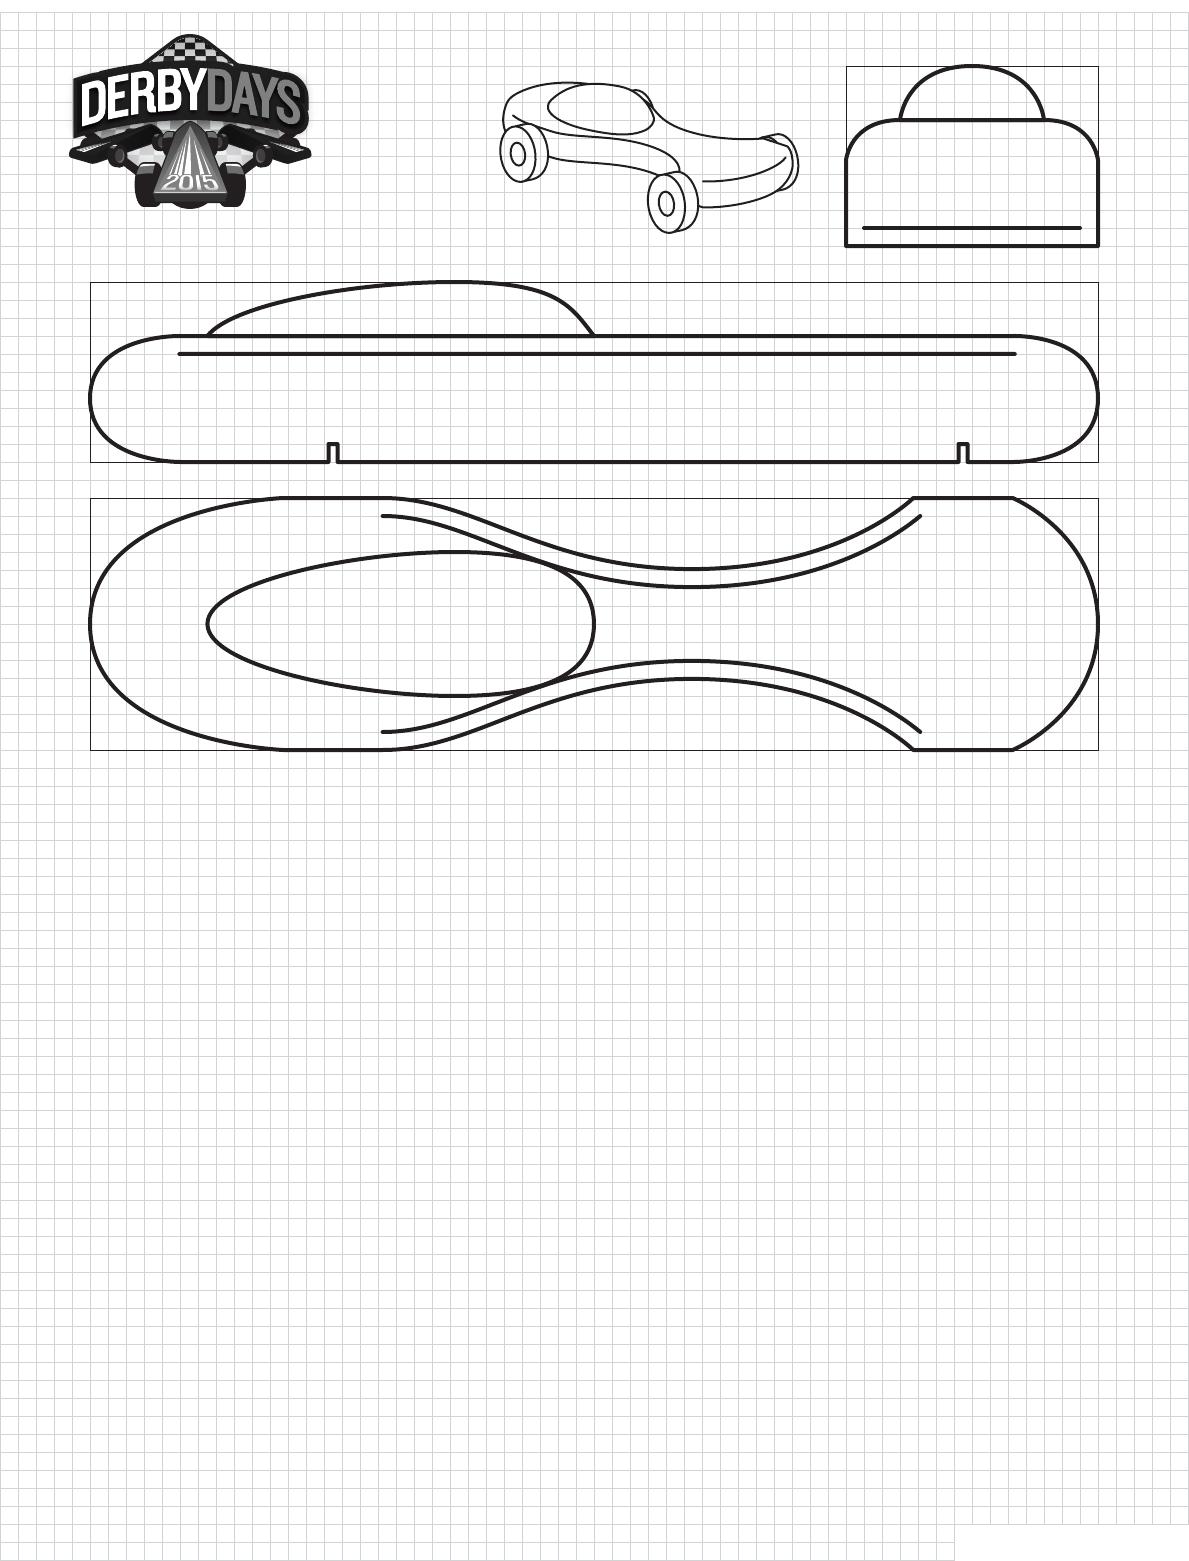 Screamer Derby Days Car Template PDF Printable